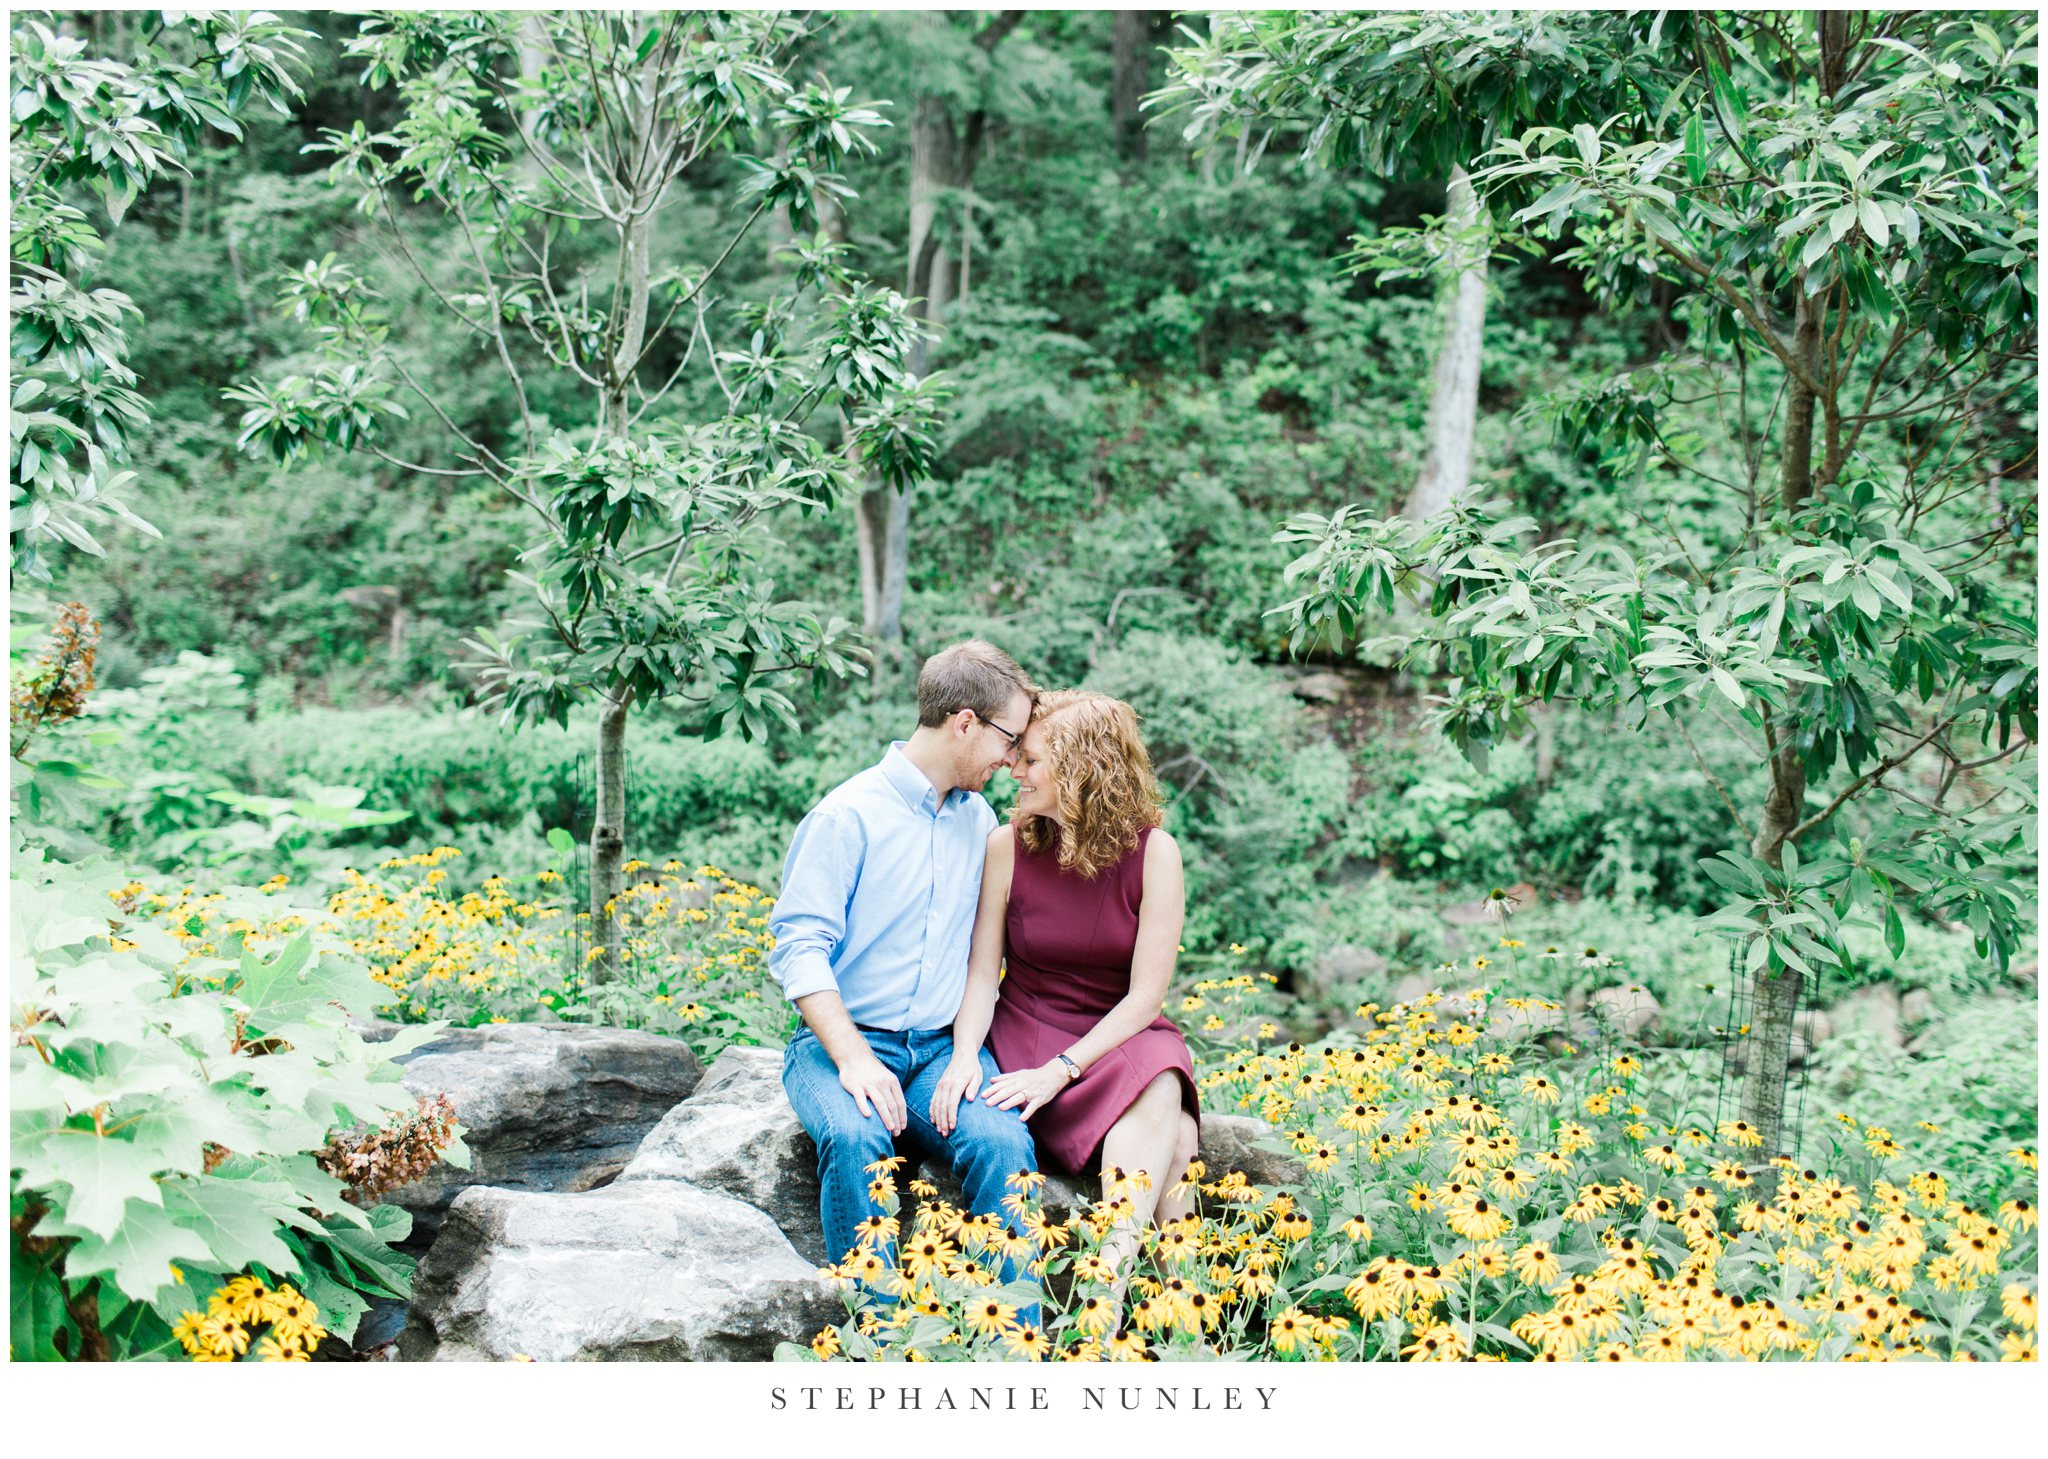 bentonville-arkansas-classic-engagement-photos-0004.jpg